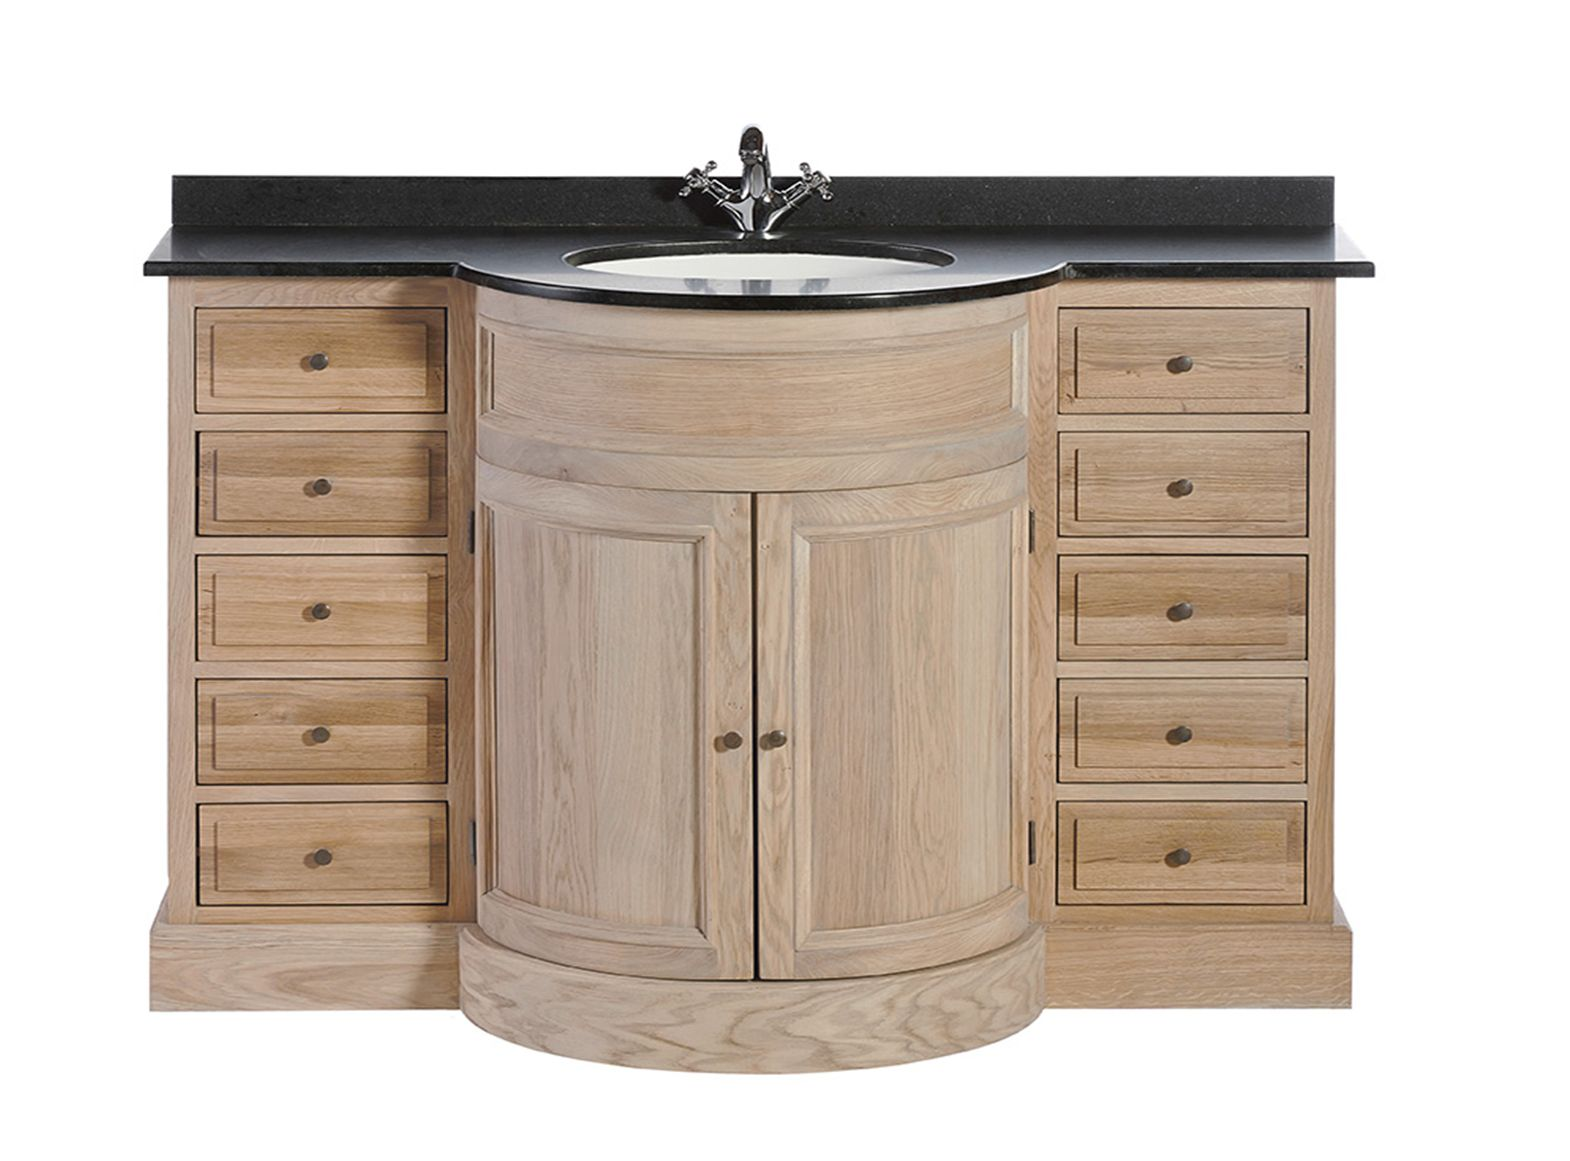 Meuble salle de bain signature haussman rond - Signature meubles ...